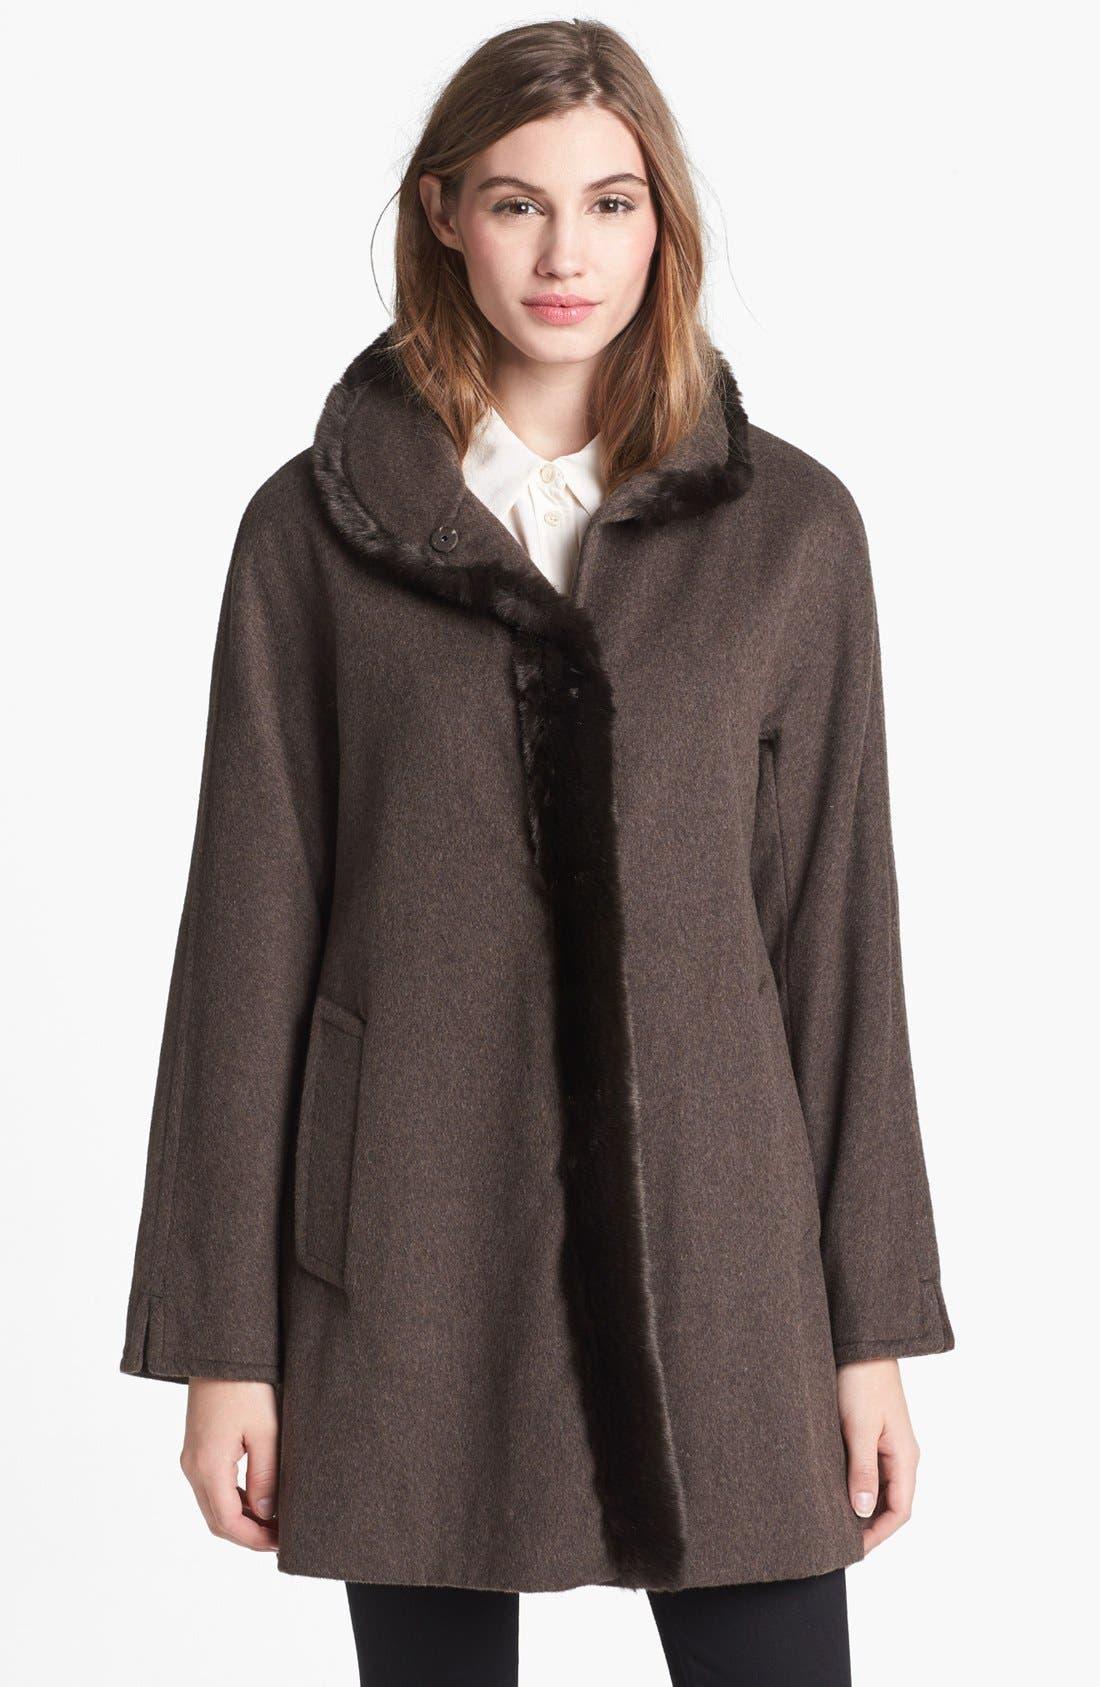 Alternate Image 1 Selected - Ellen Tracy Faux Fur Trim Wool Blend Coat (Online Only)